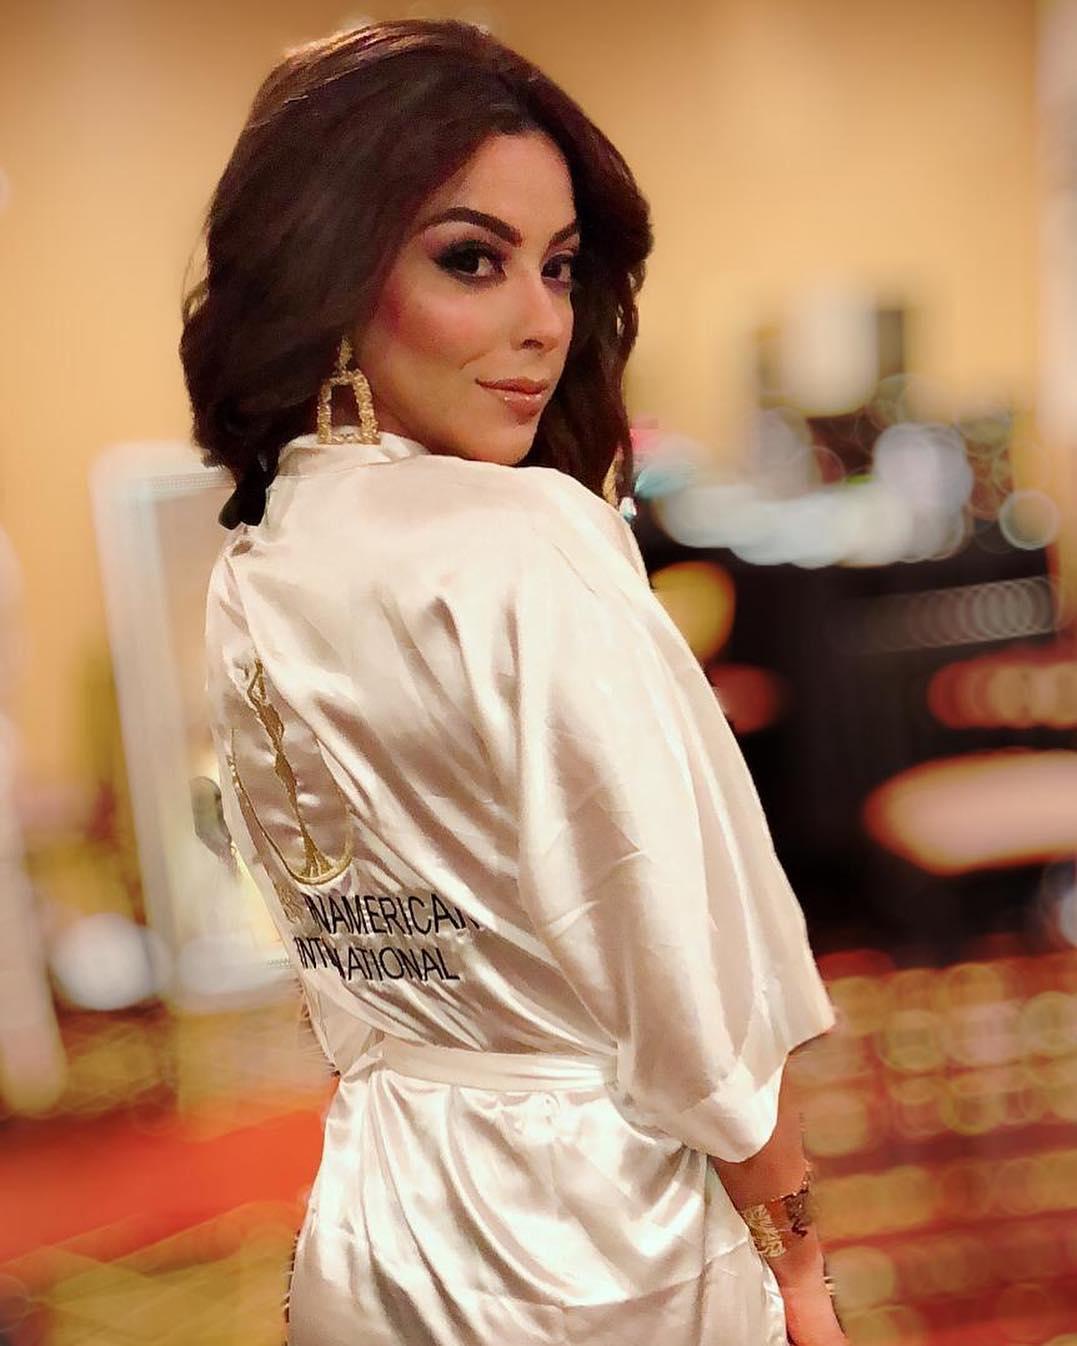 itzel paola astudillo, miss chiapas 2020 para miss mexico 2021/primera finalista de miss panamerican international 2018/top 16 de miss earth 2016. - Página 6 42336510